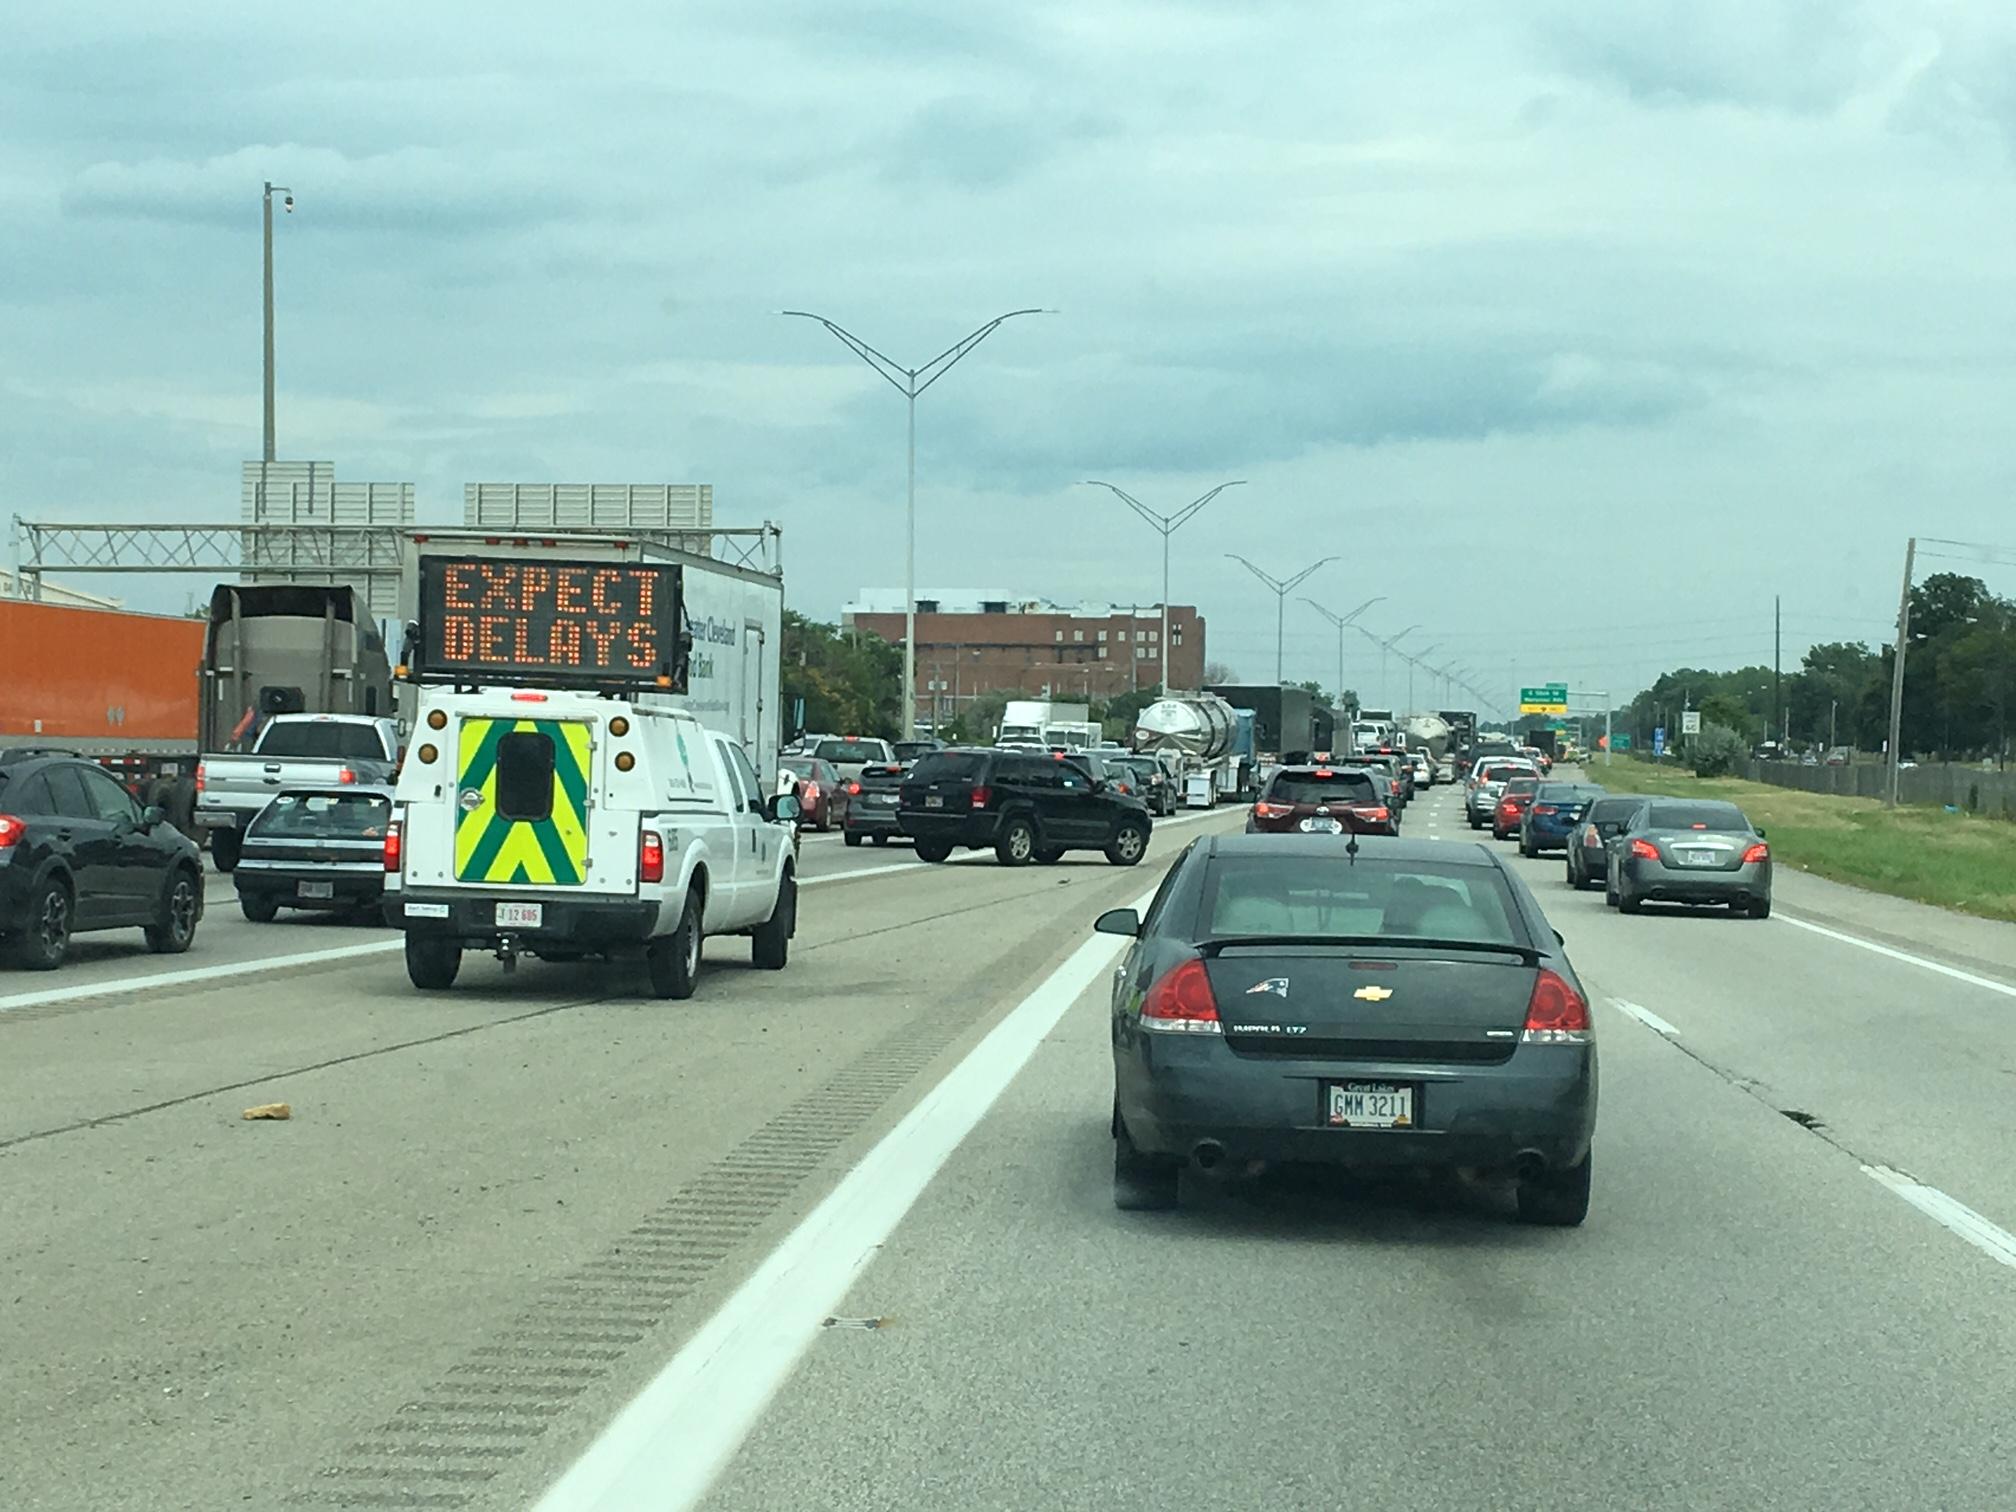 Accident closes lanes, backs up traffic on I-90   WKYC.com